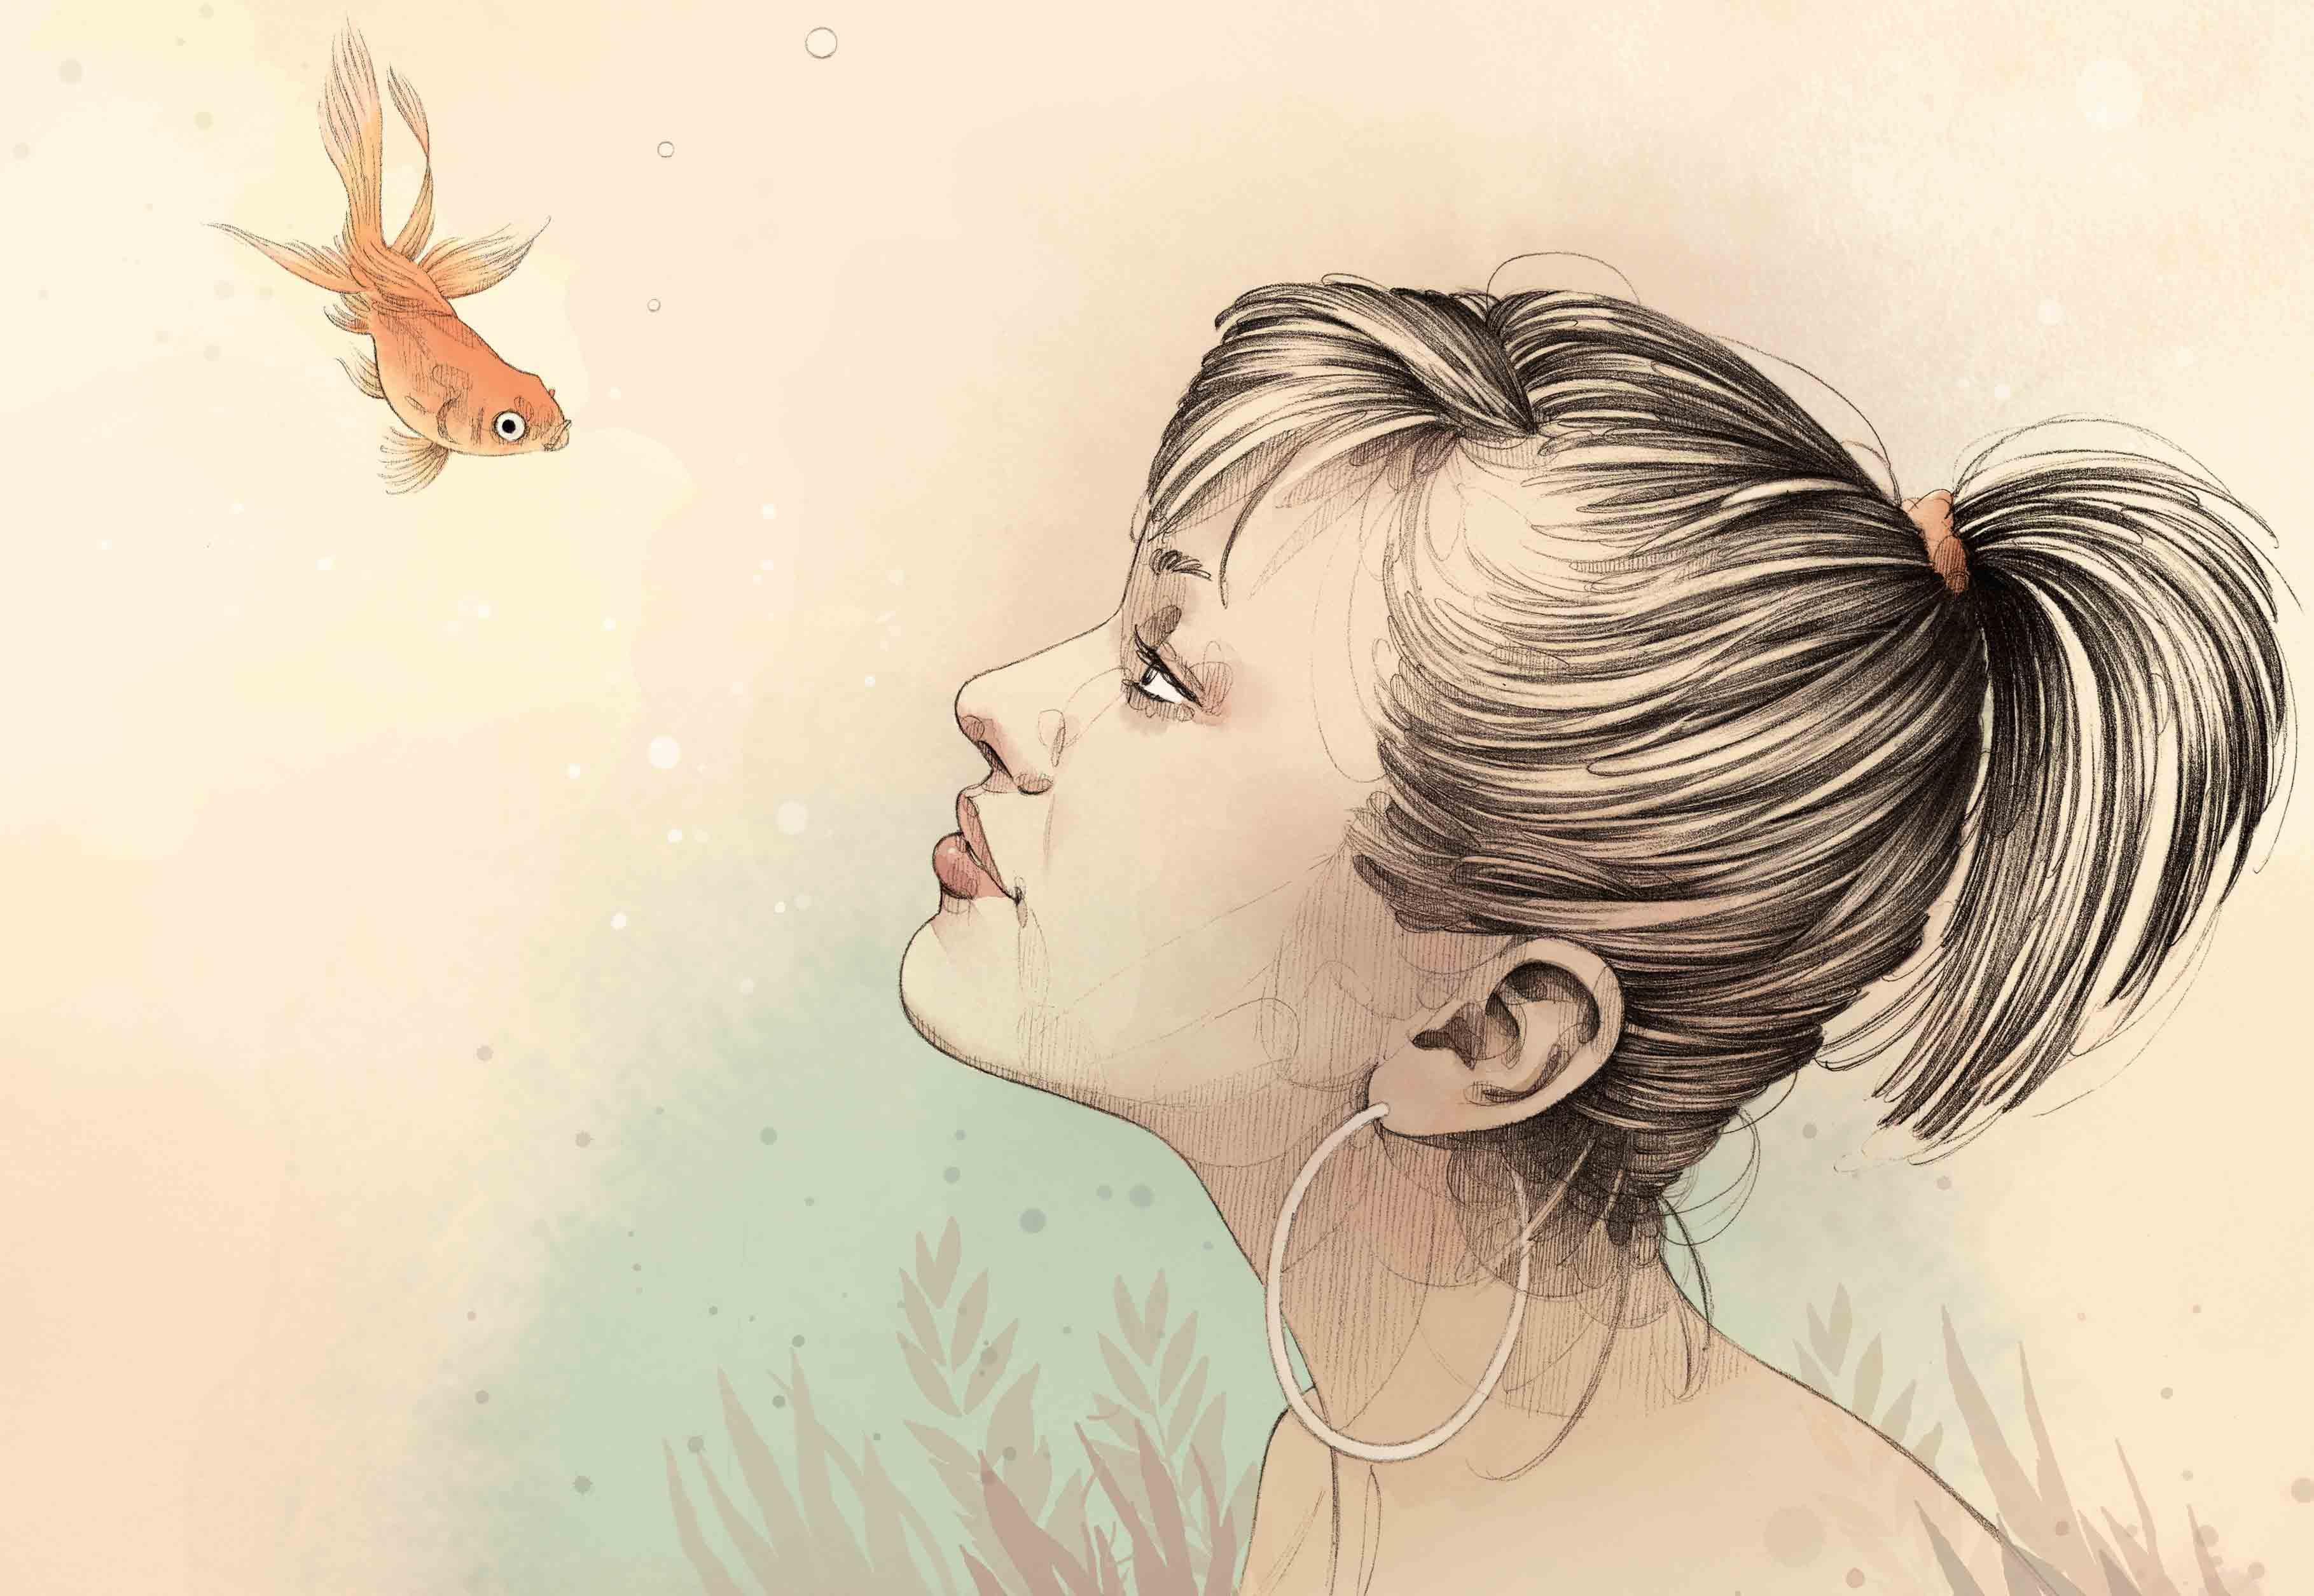 Femme regarde un poisson miniature